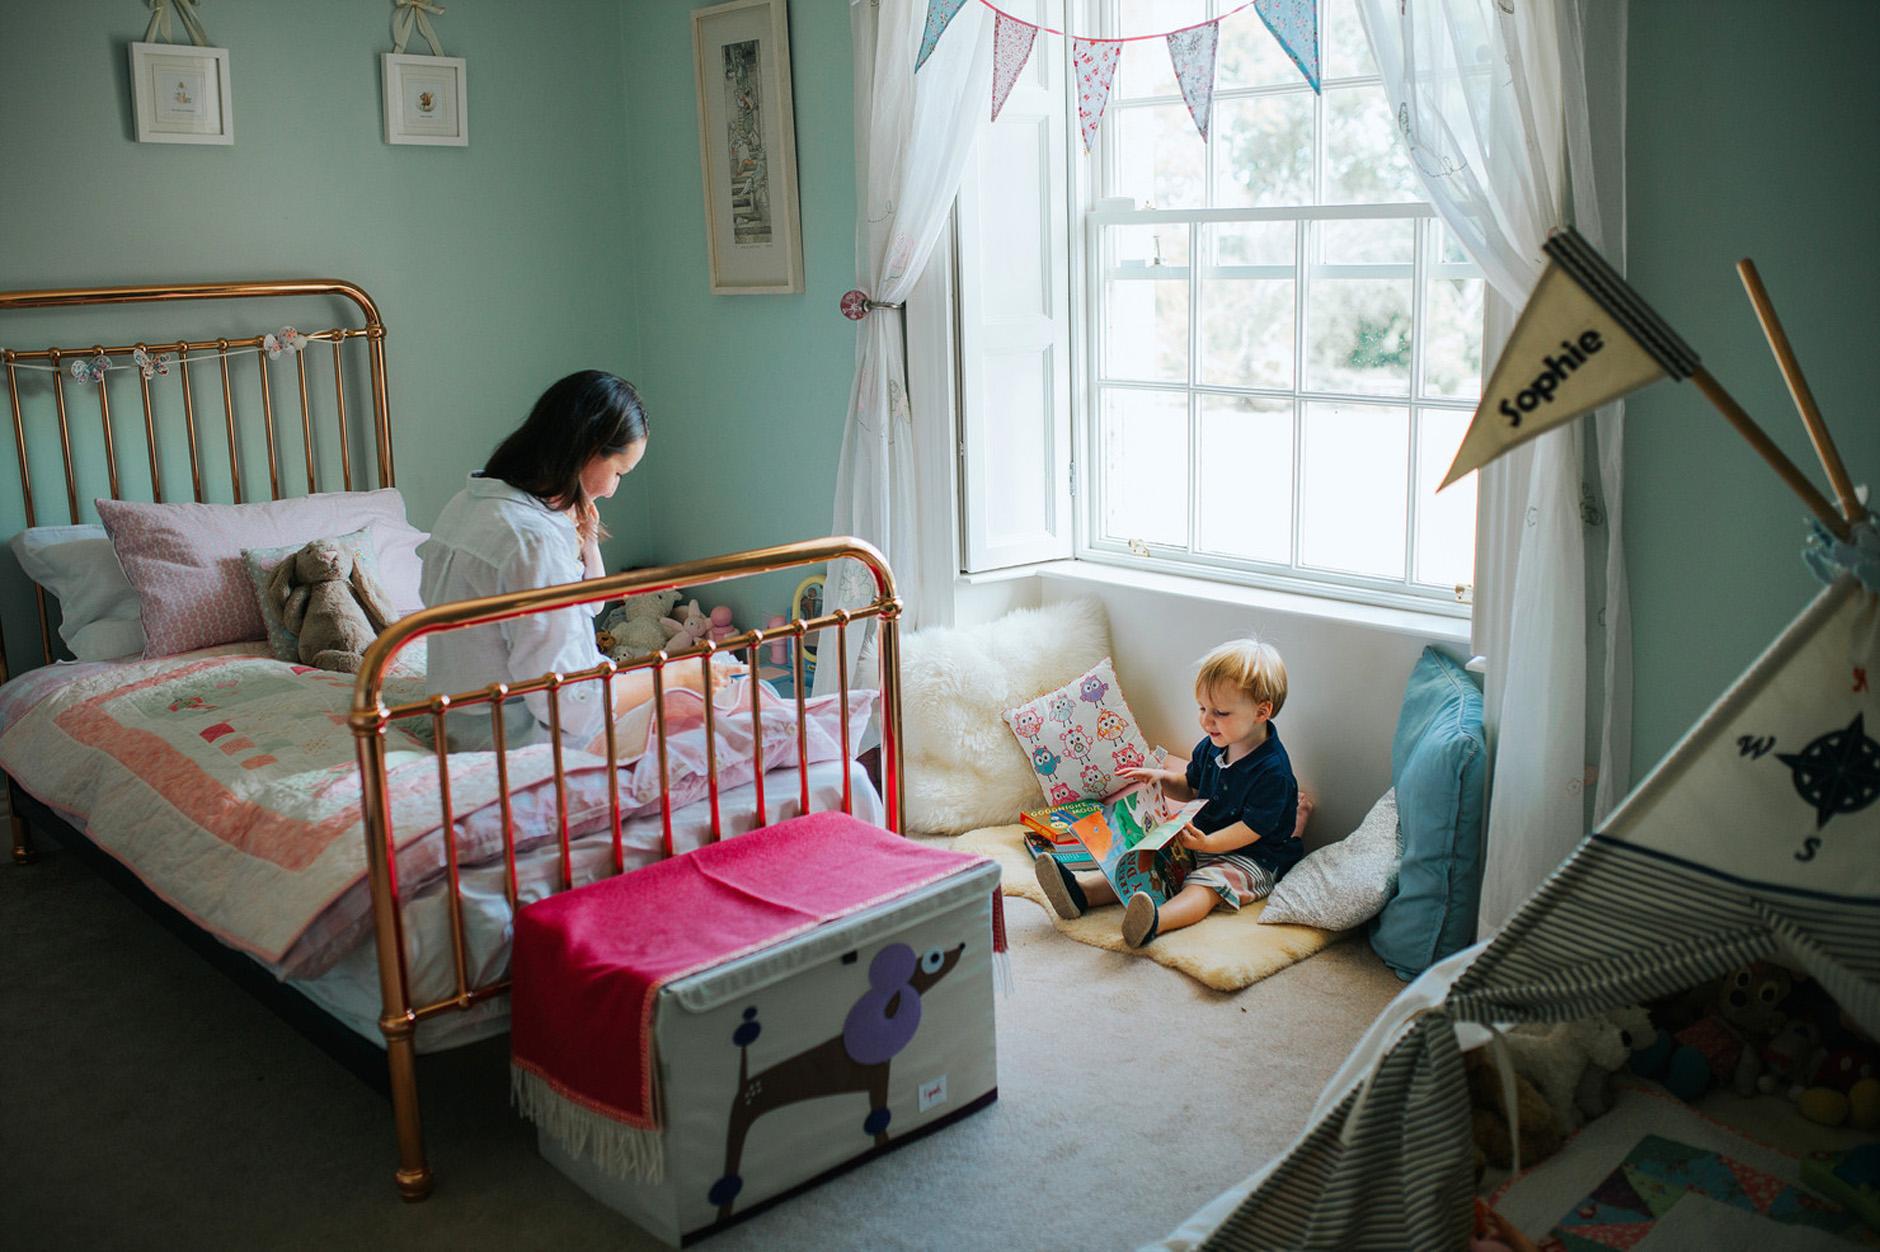 candid-natural-children-family-photographer-dublin-0137.jpg